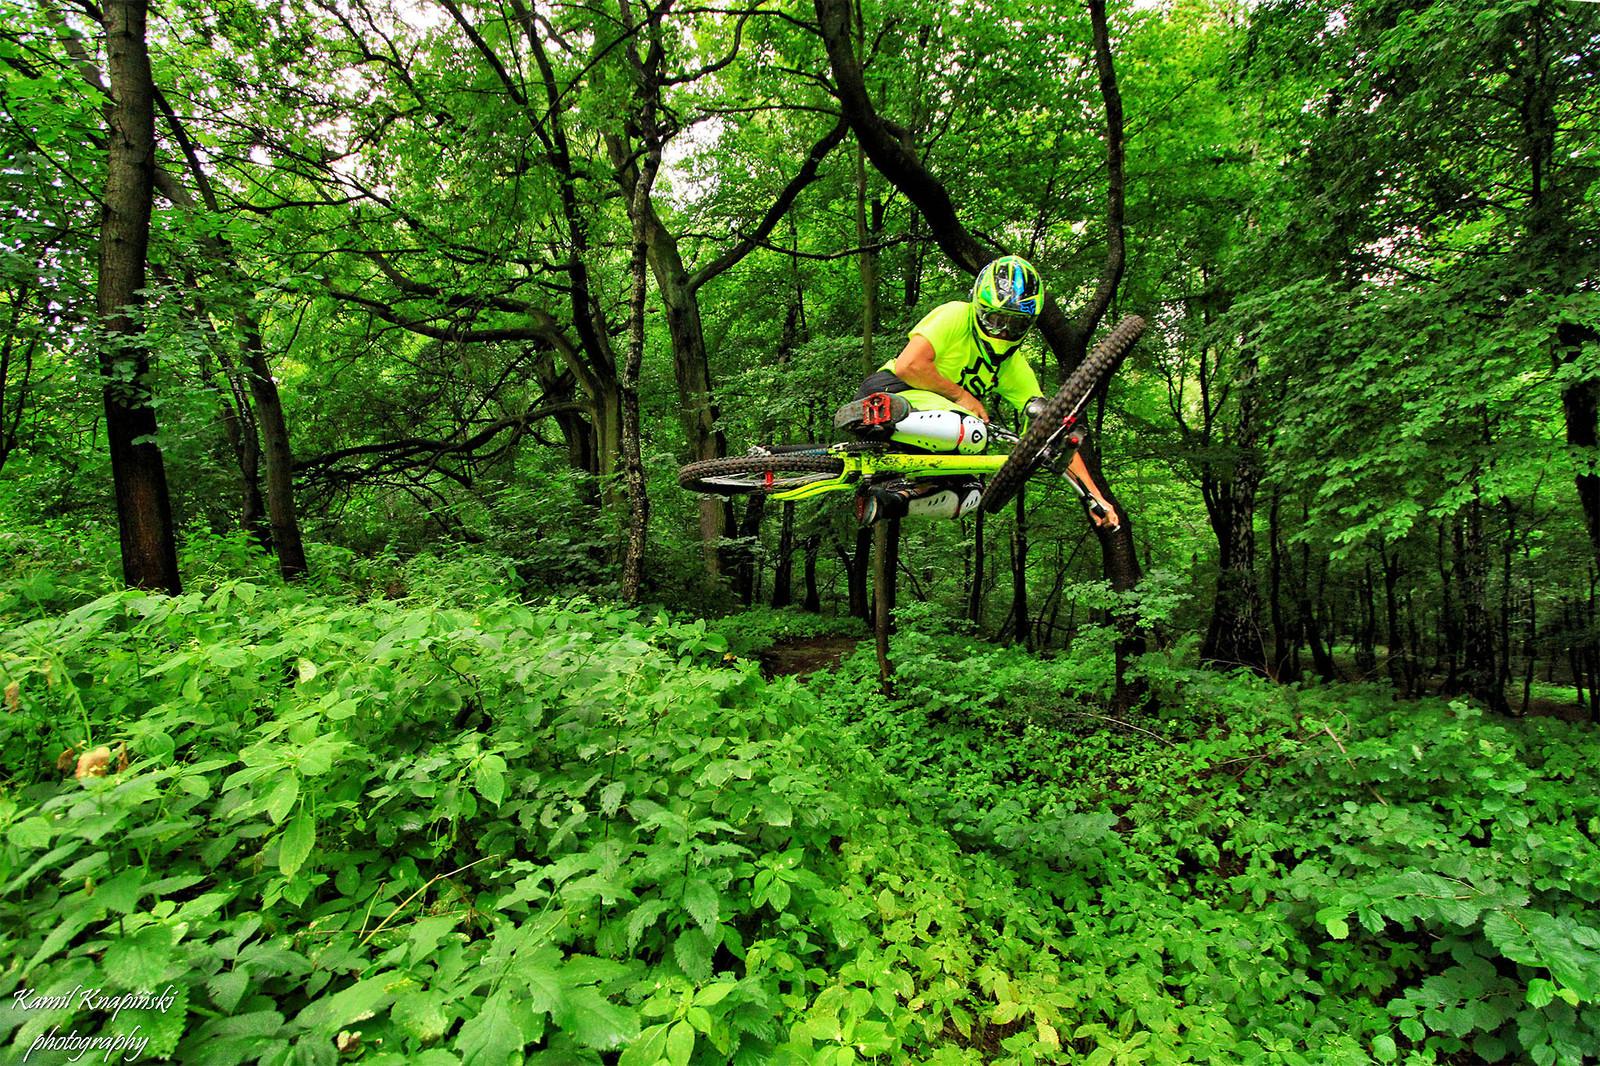 Green Screan  - Tafi92 - Mountain Biking Pictures - Vital MTB